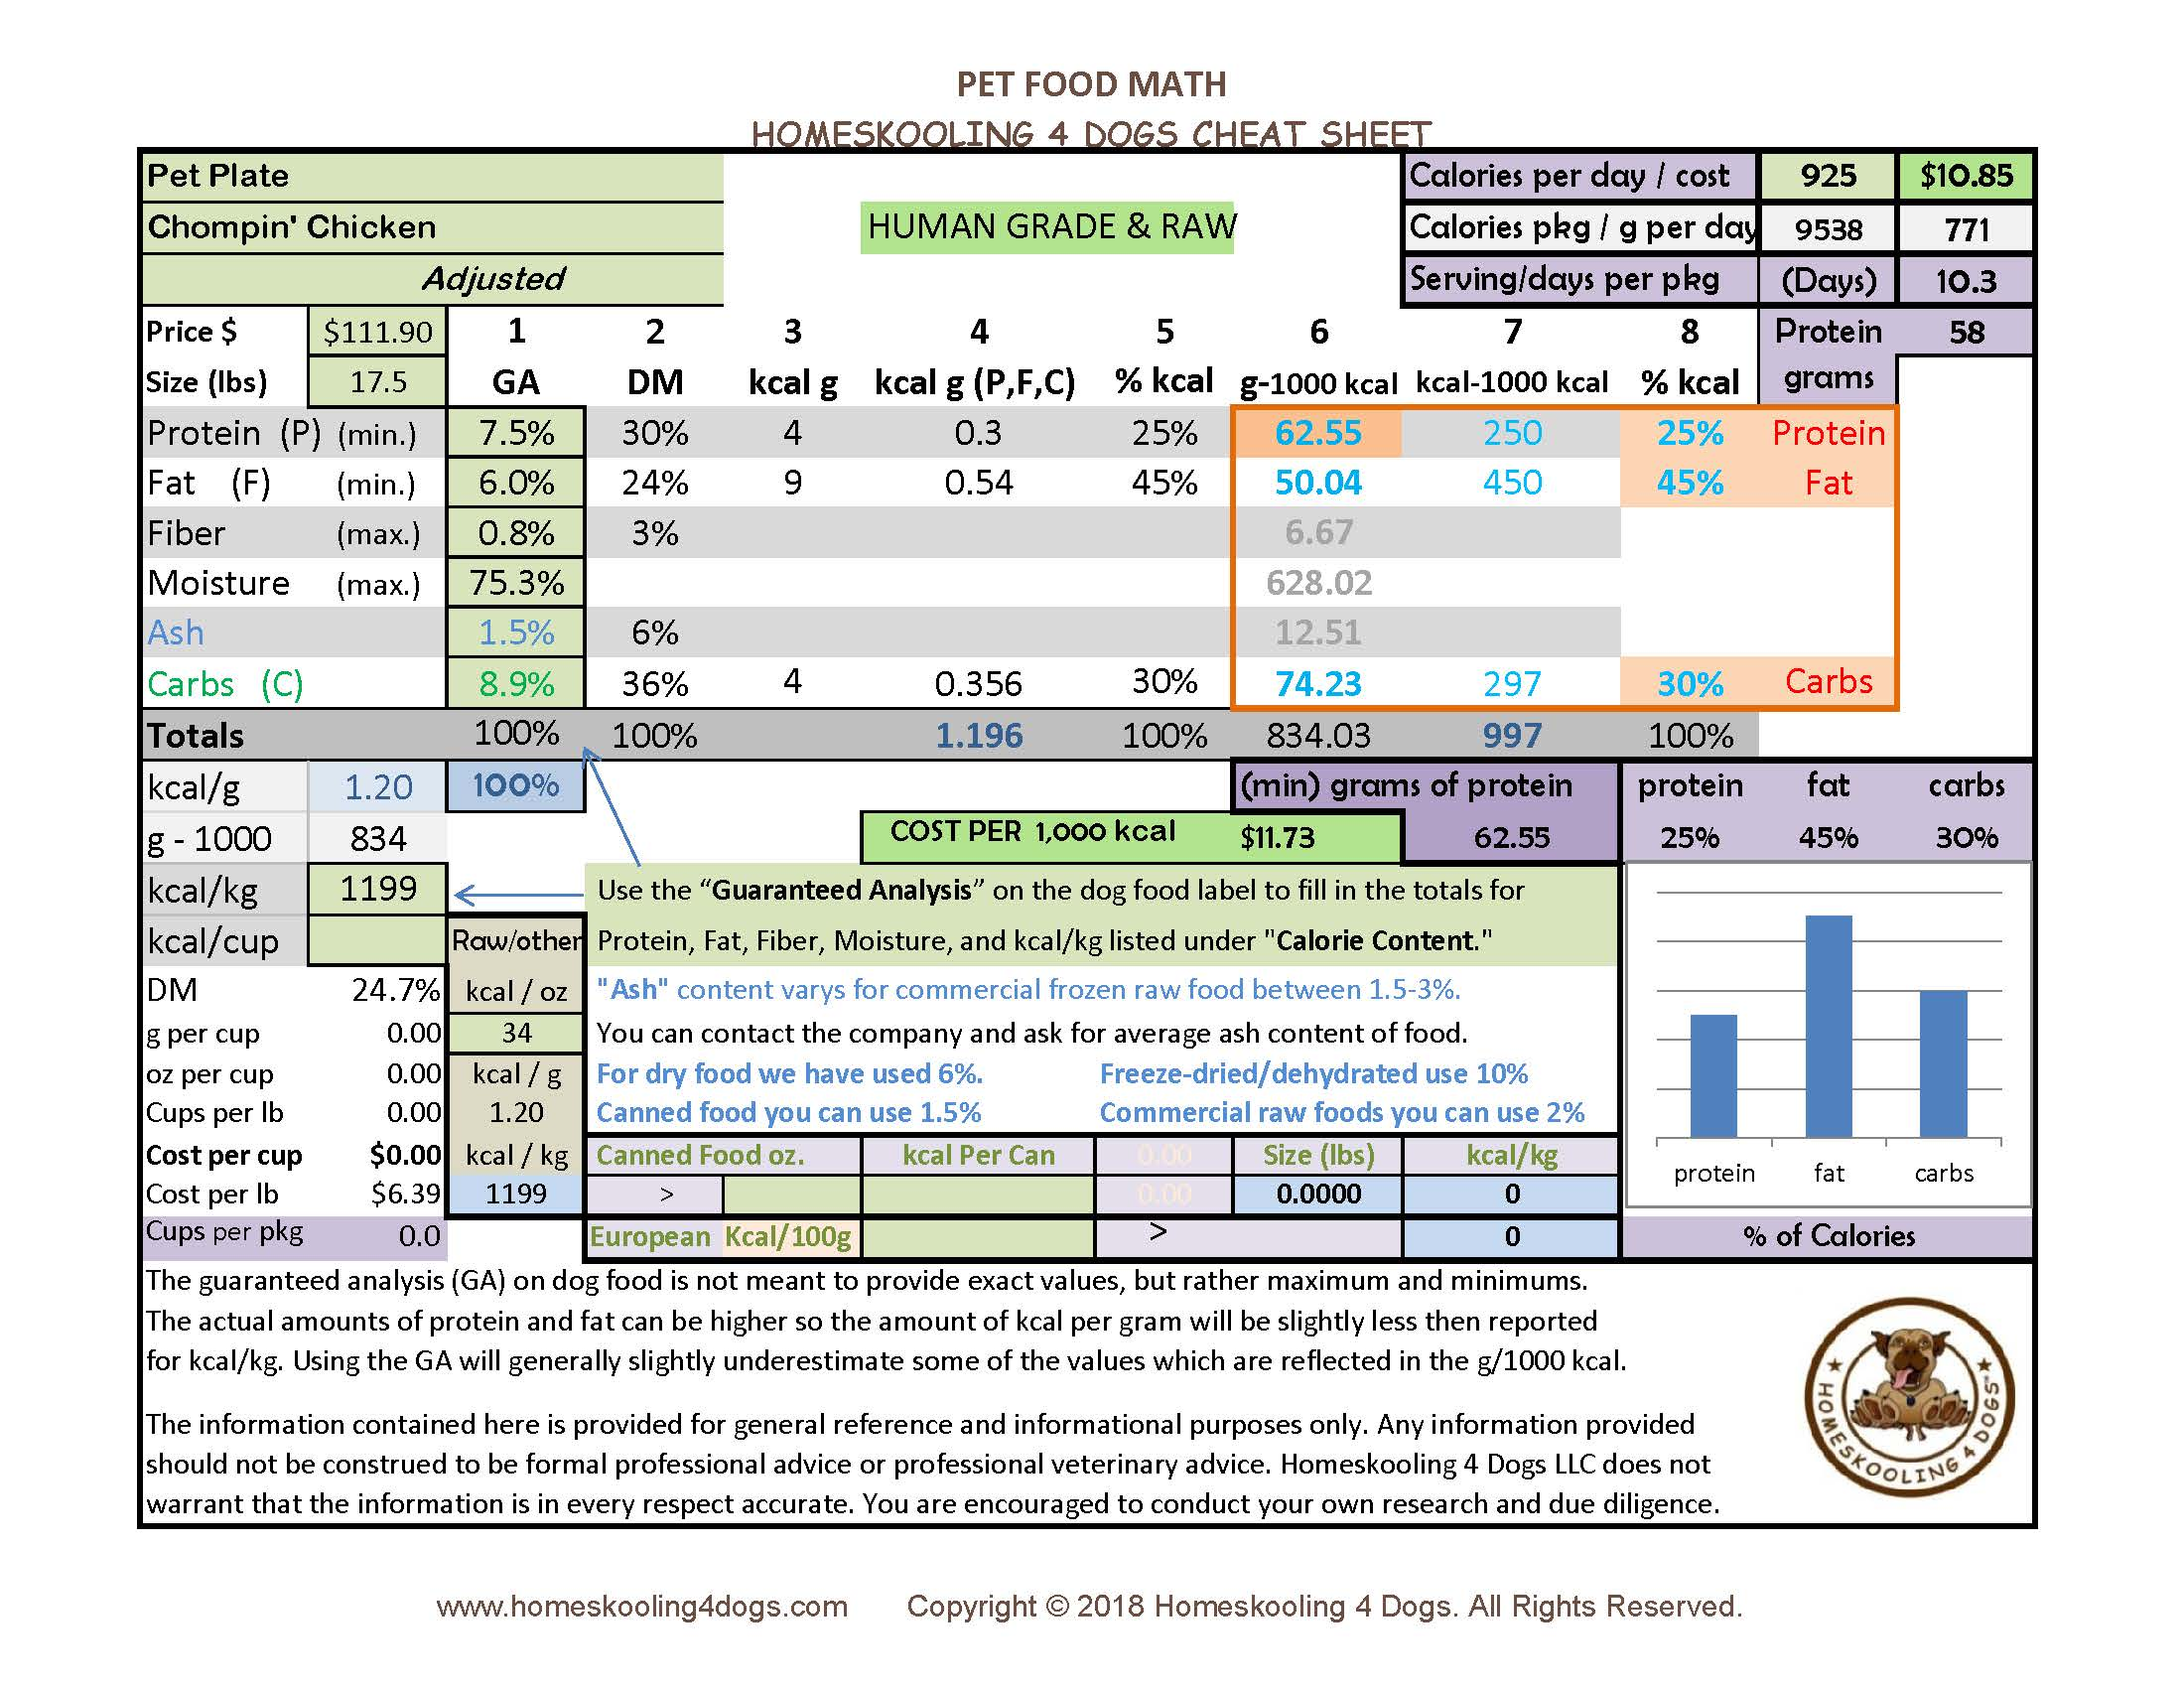 Pet Plate - Adjusted Numbers